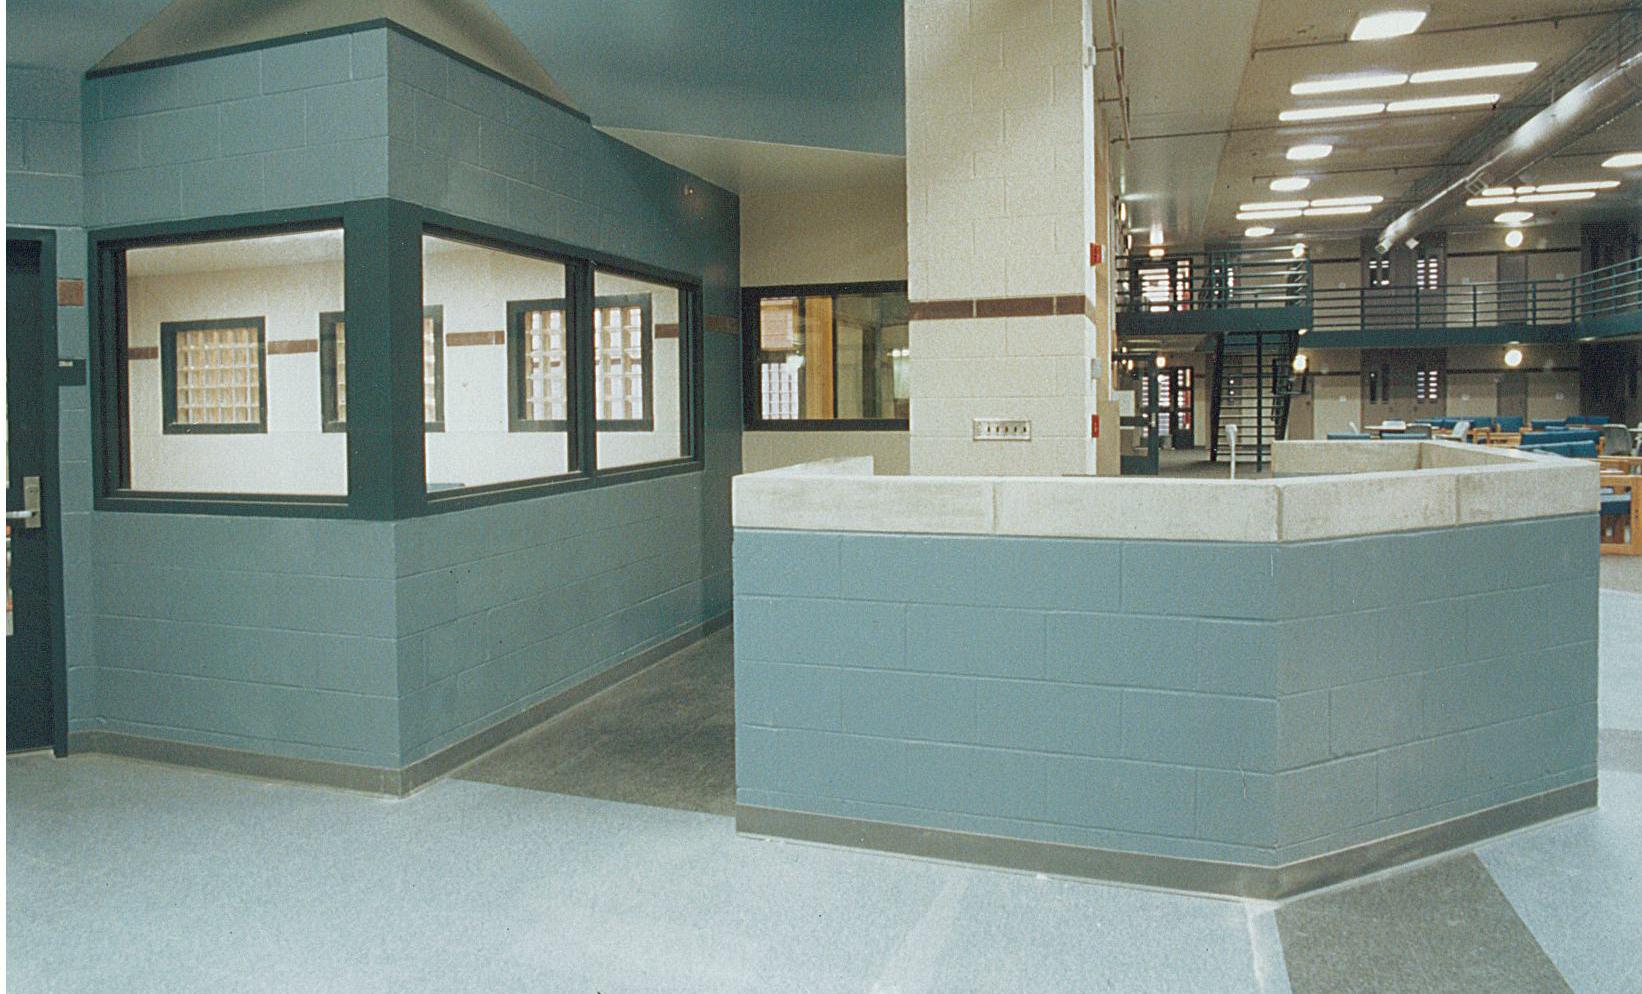 Onondaga County Justice Center